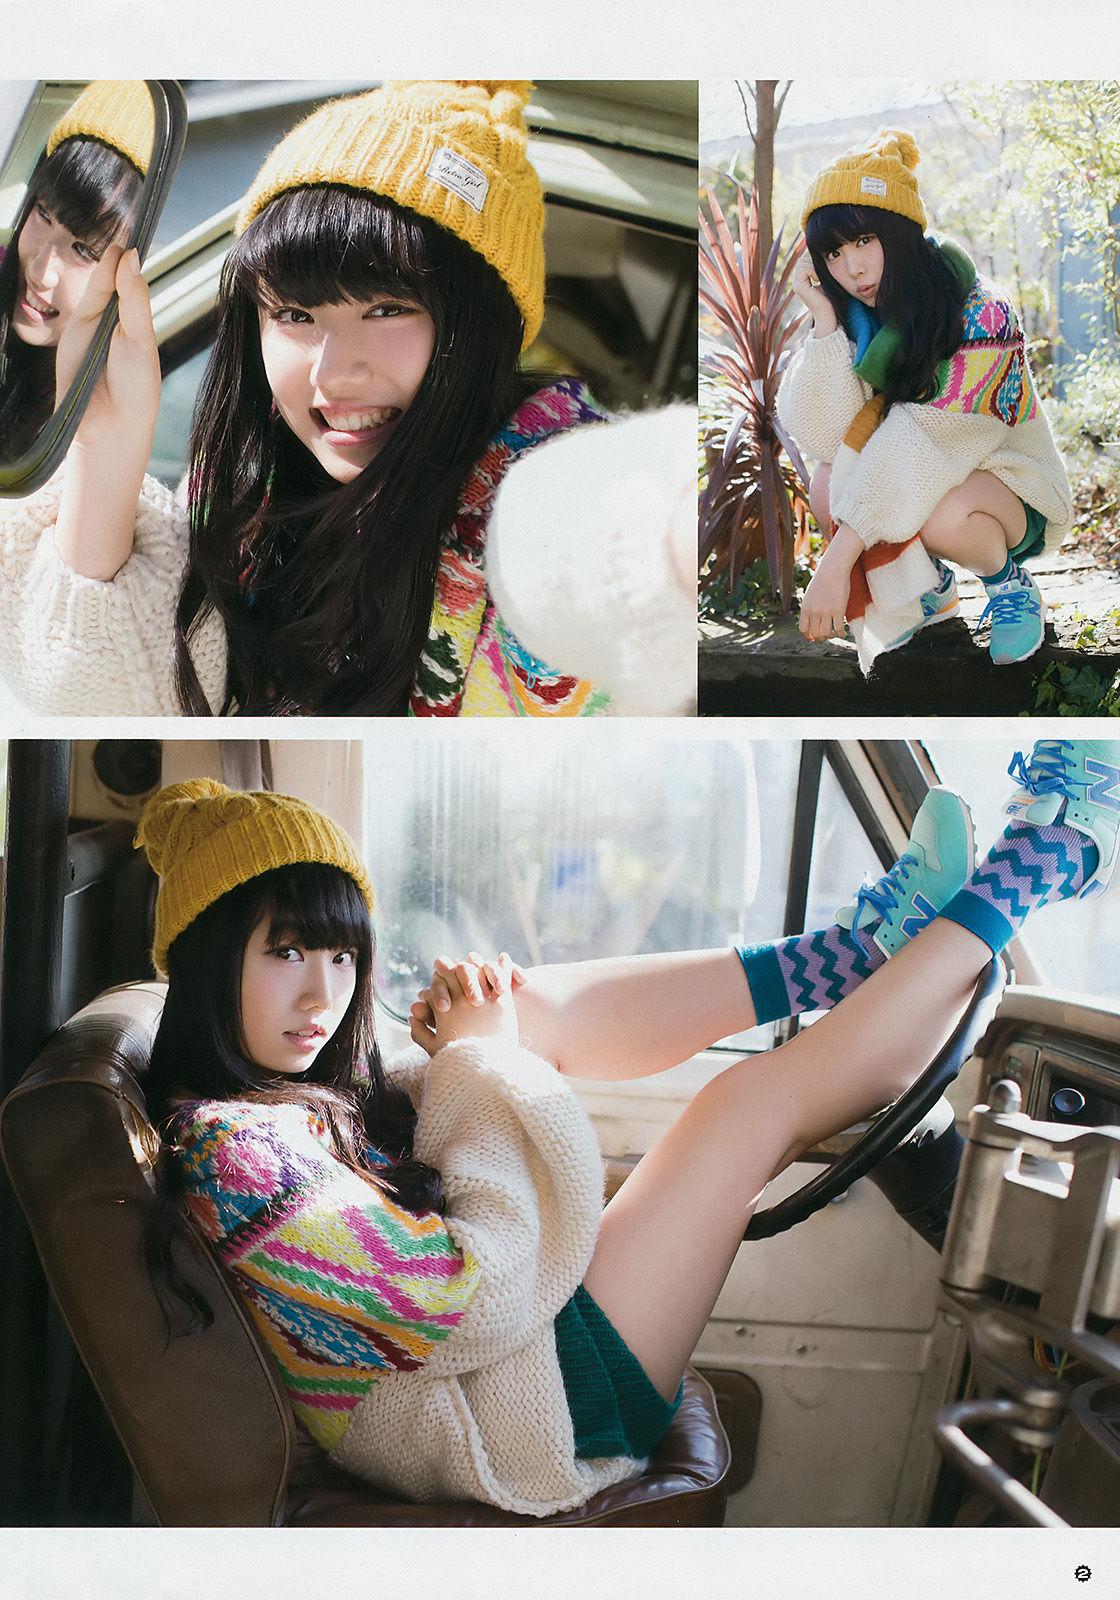 VOL.477 [Young Gangan]杂志:广田爱花超高清写真套图(14P)